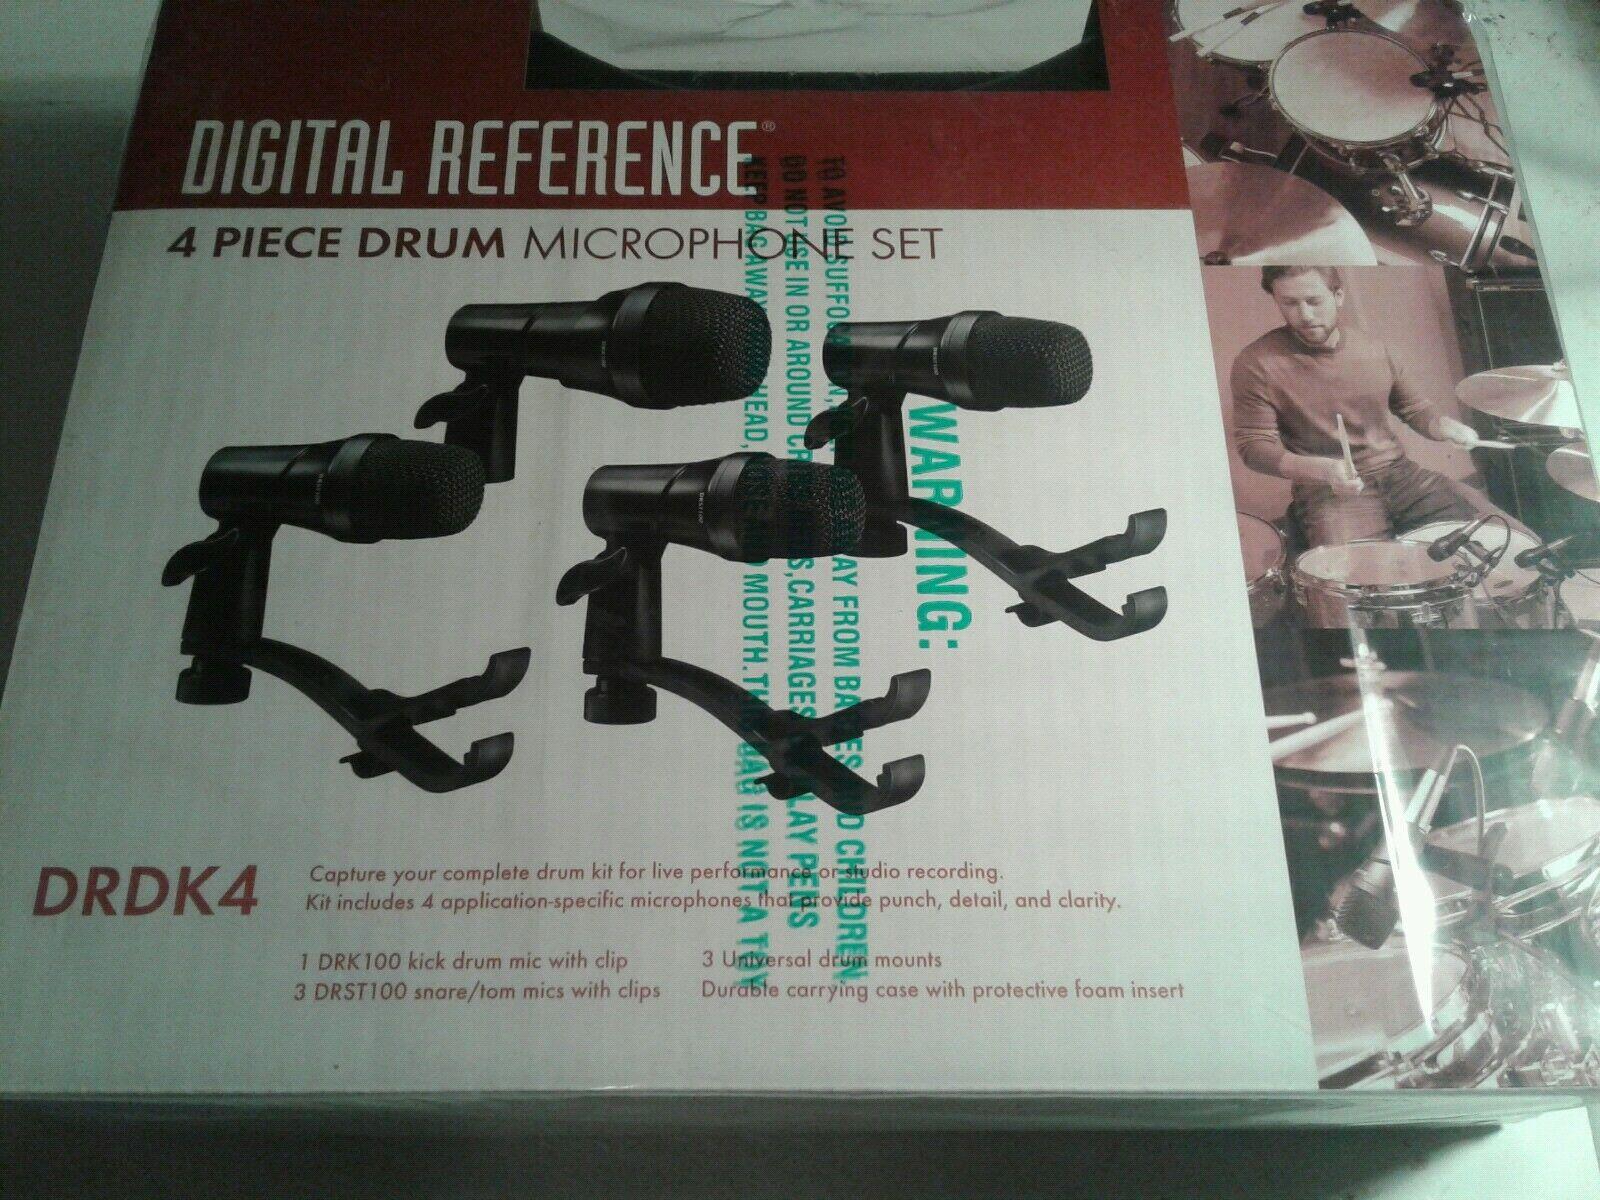 Digital Reference DRDK4 4-Piece Drum Mic Kit